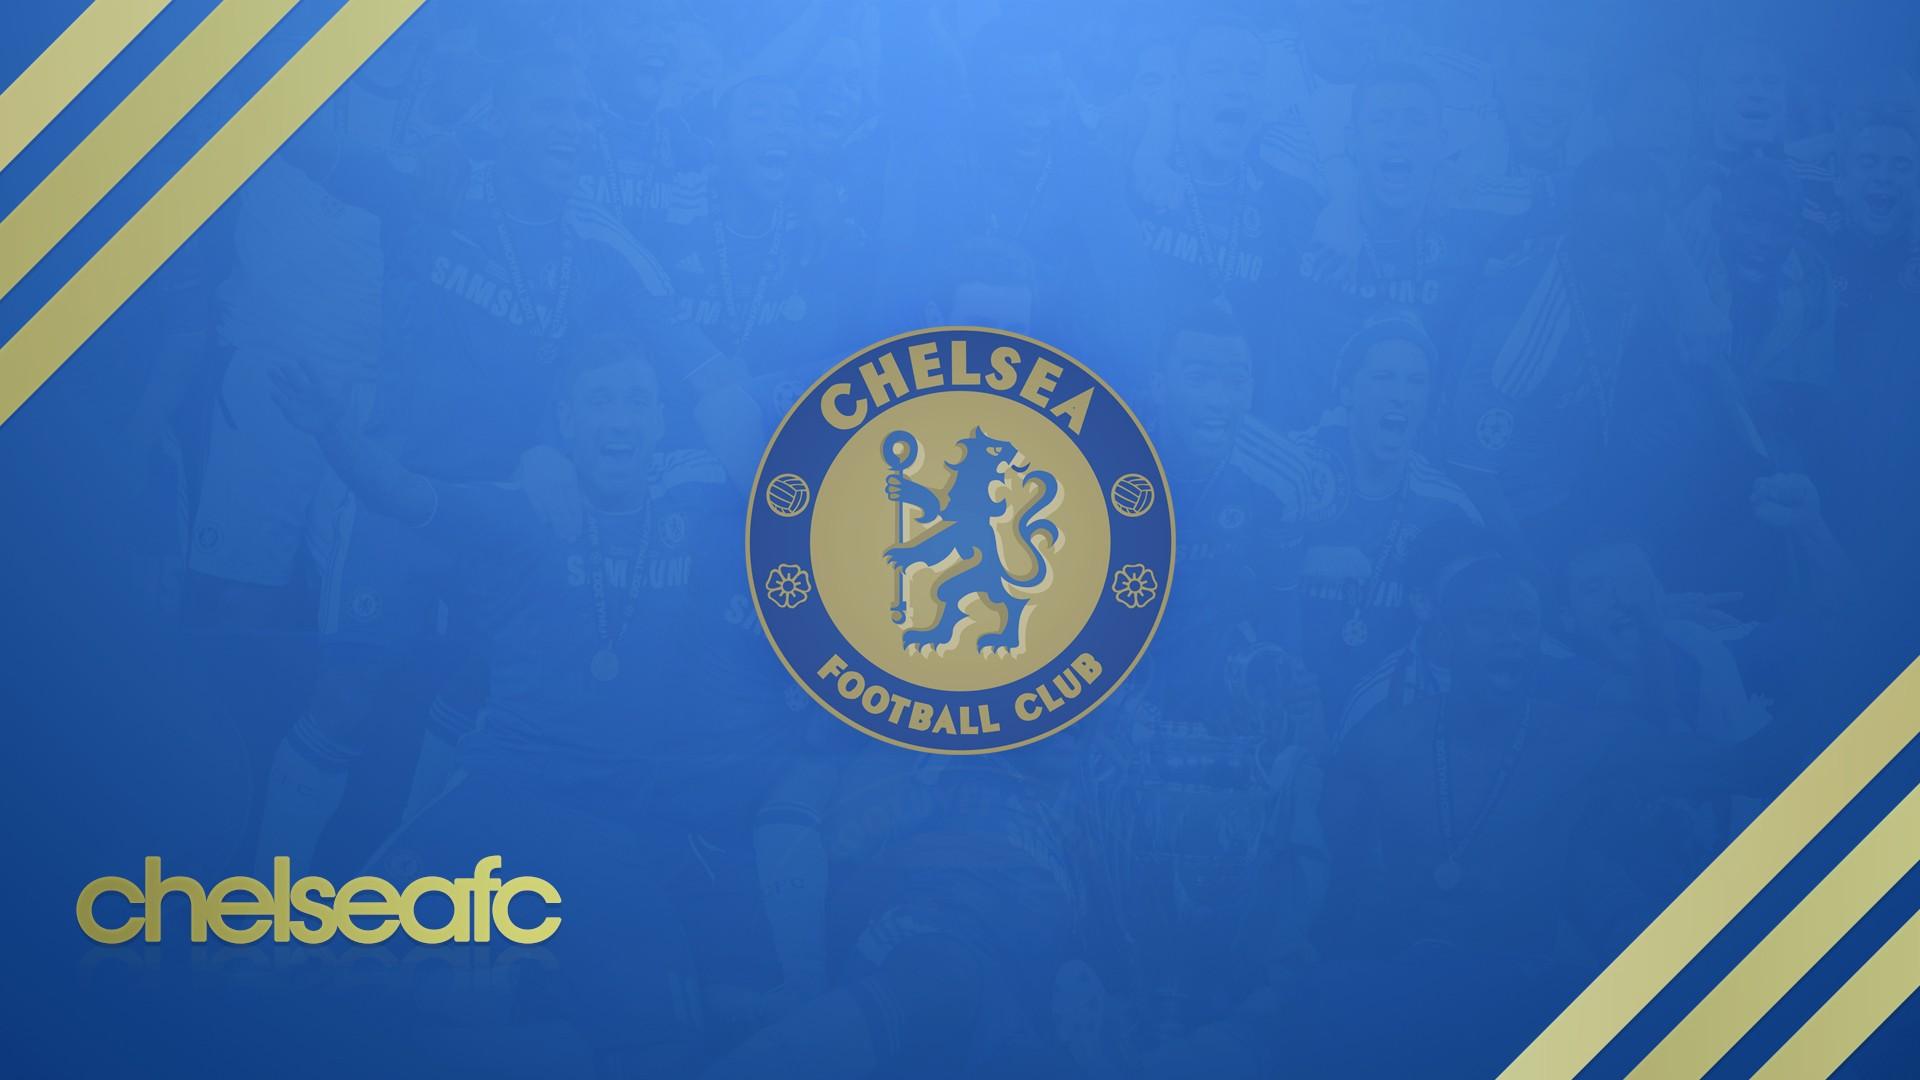 Chelsea-FC-wallpaper-wpc5803407